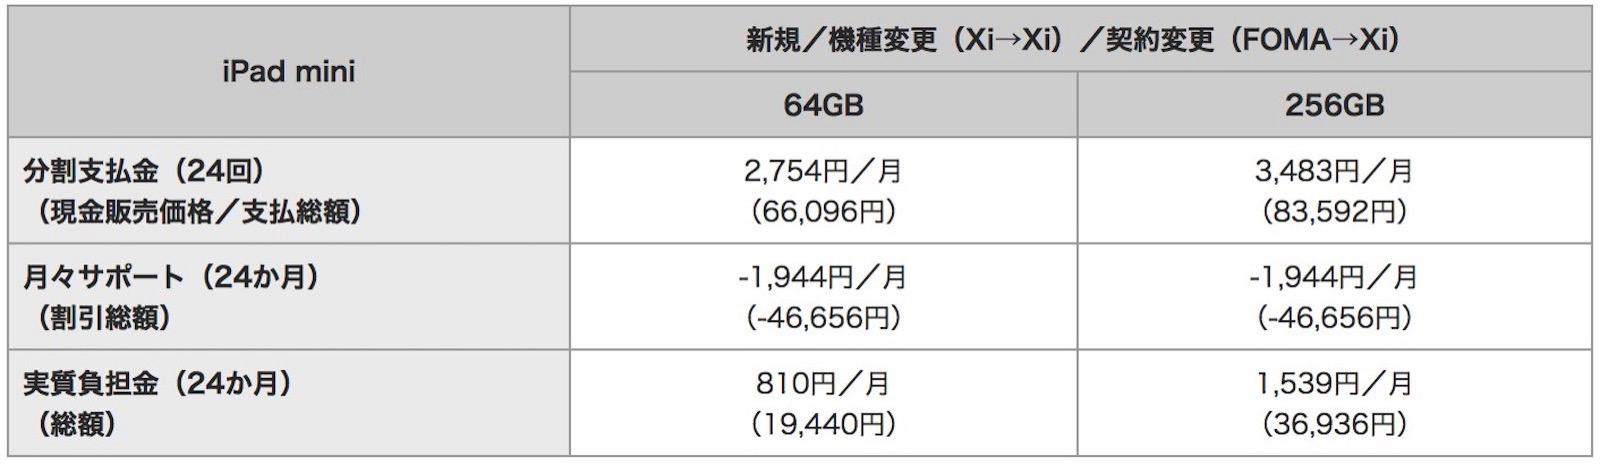 docomo-ipad-mini-pricing.jpg